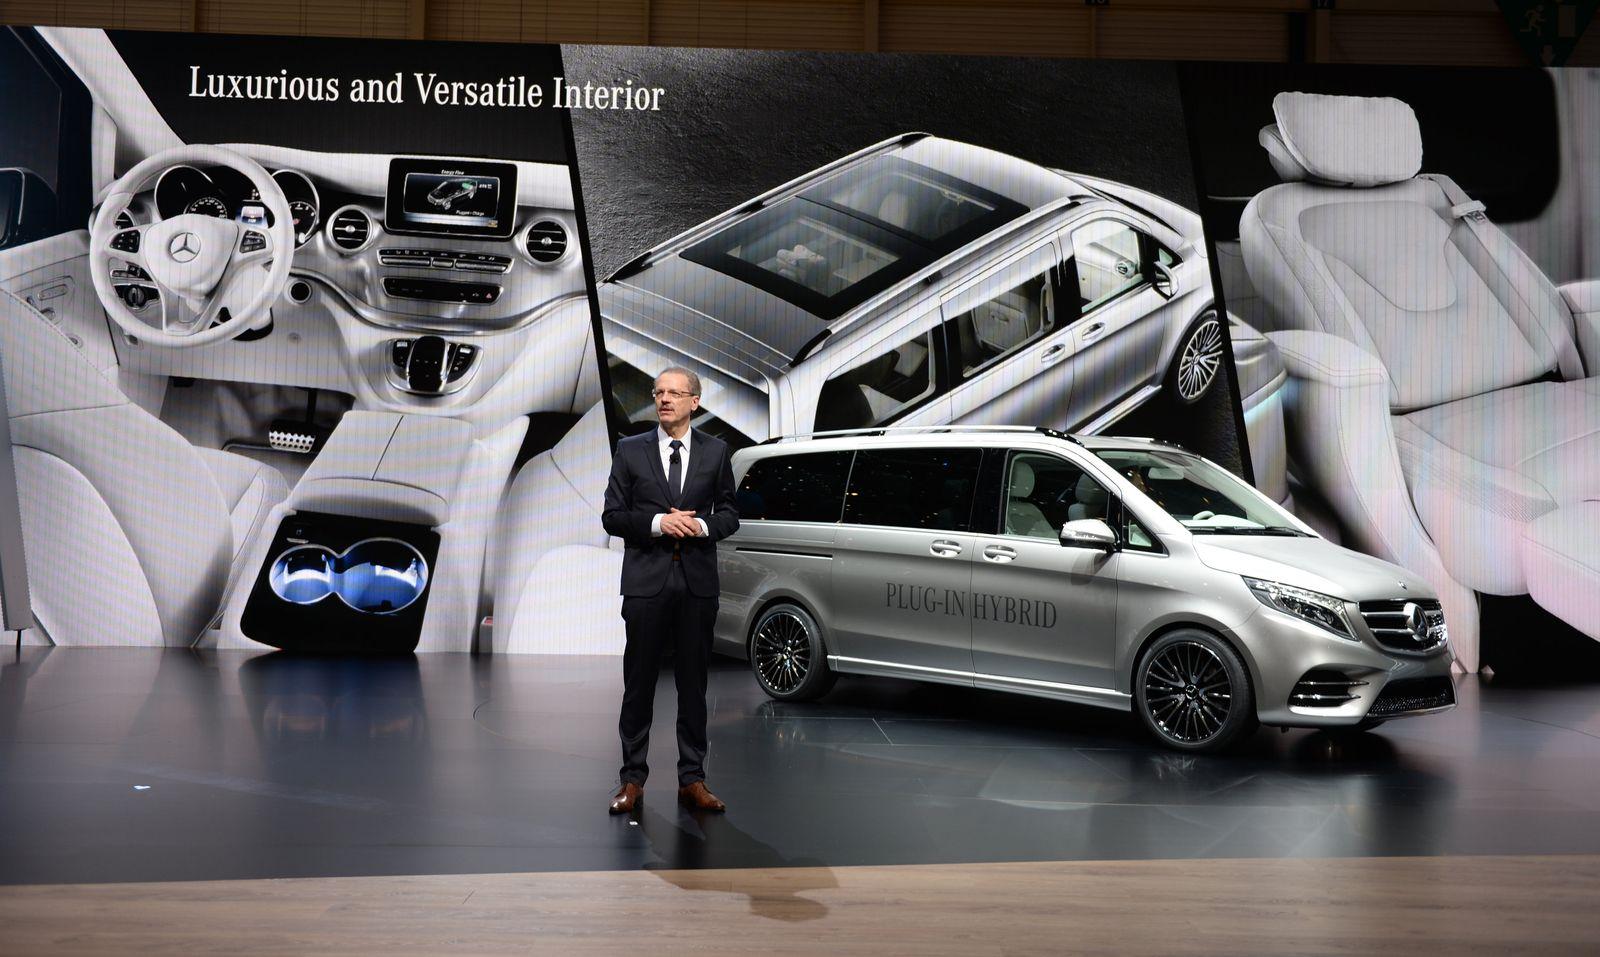 Genf/ 85. Automobil-Salon/ Volker Mornhinweg/ Mercedes-Benz/ Vans/ V-ision e